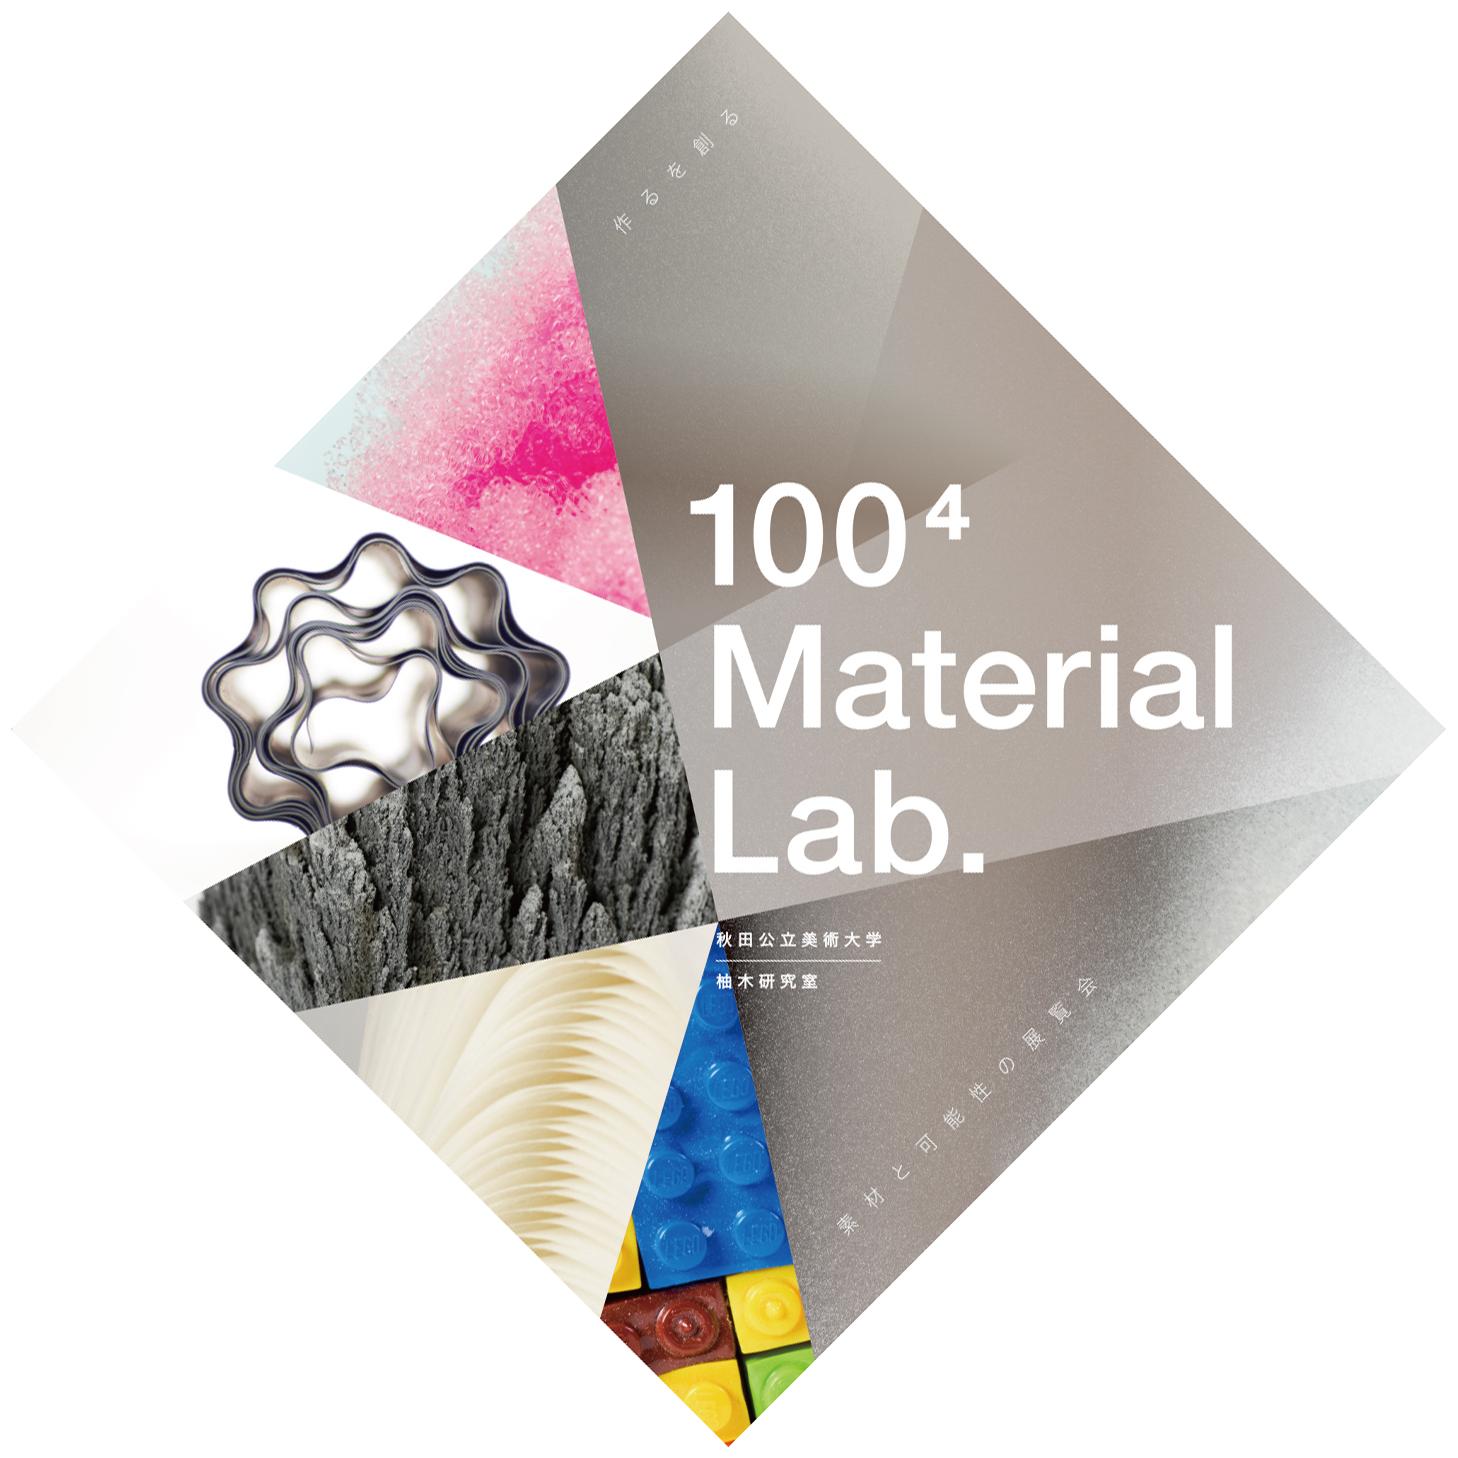 100⁴ Material Lab. ―作るを創る、素材と可能性の展覧会―